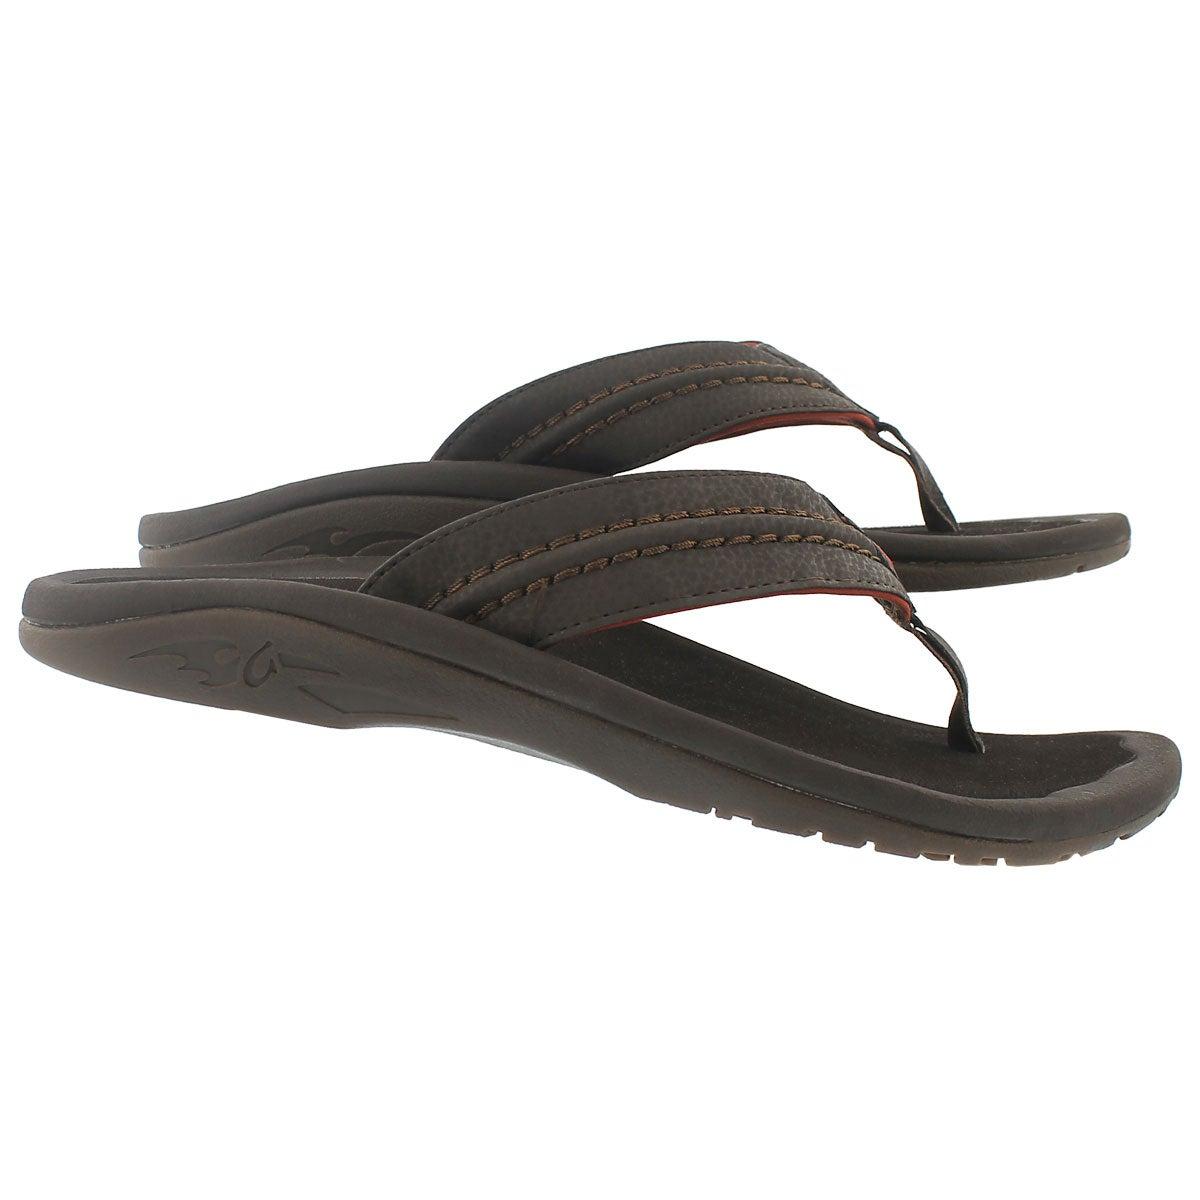 Mns Hokua dark java thong sandal